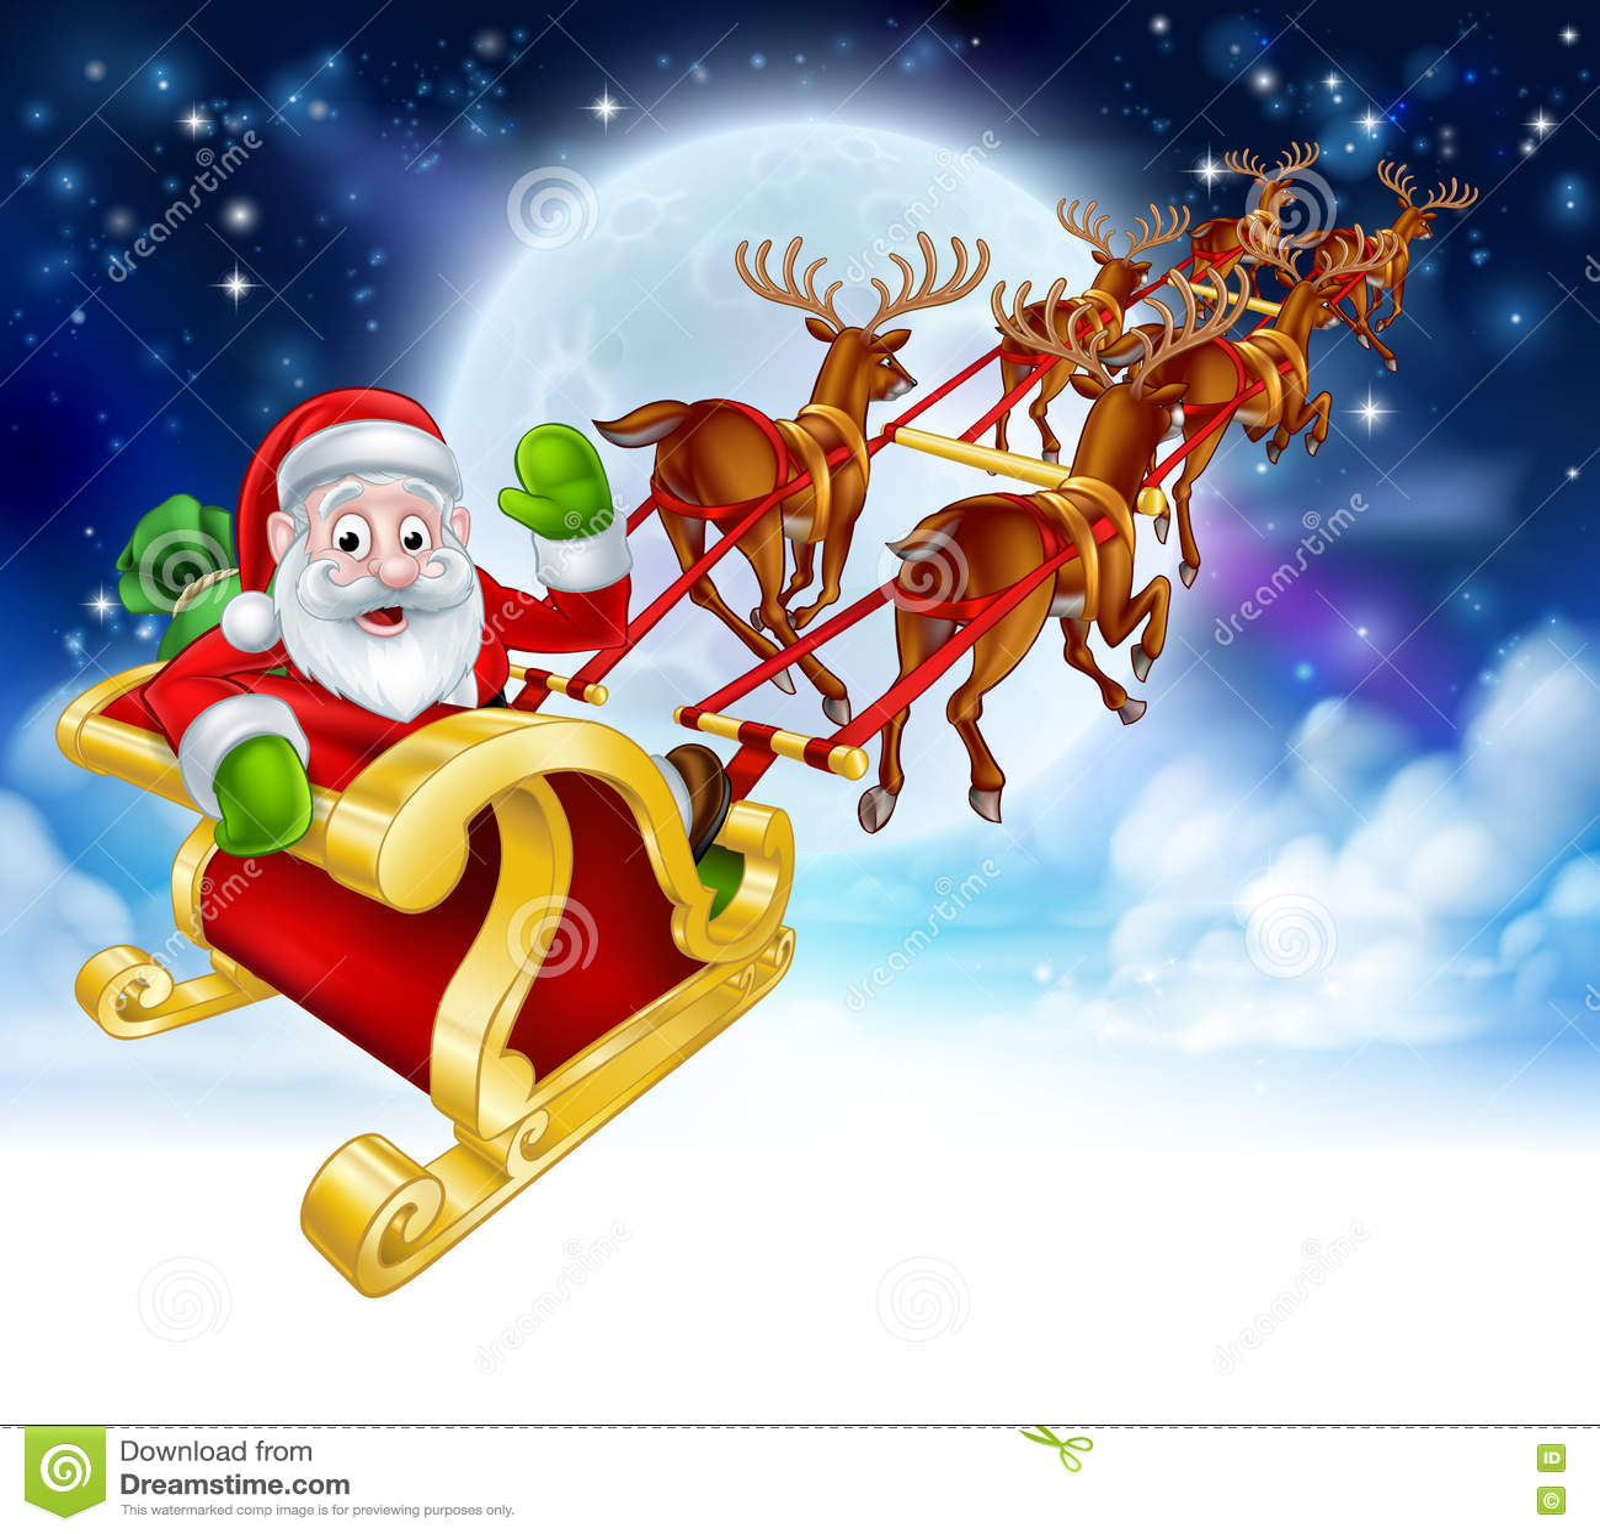 Escena de Santa Reindeer Sleigh Cartoon Christmas